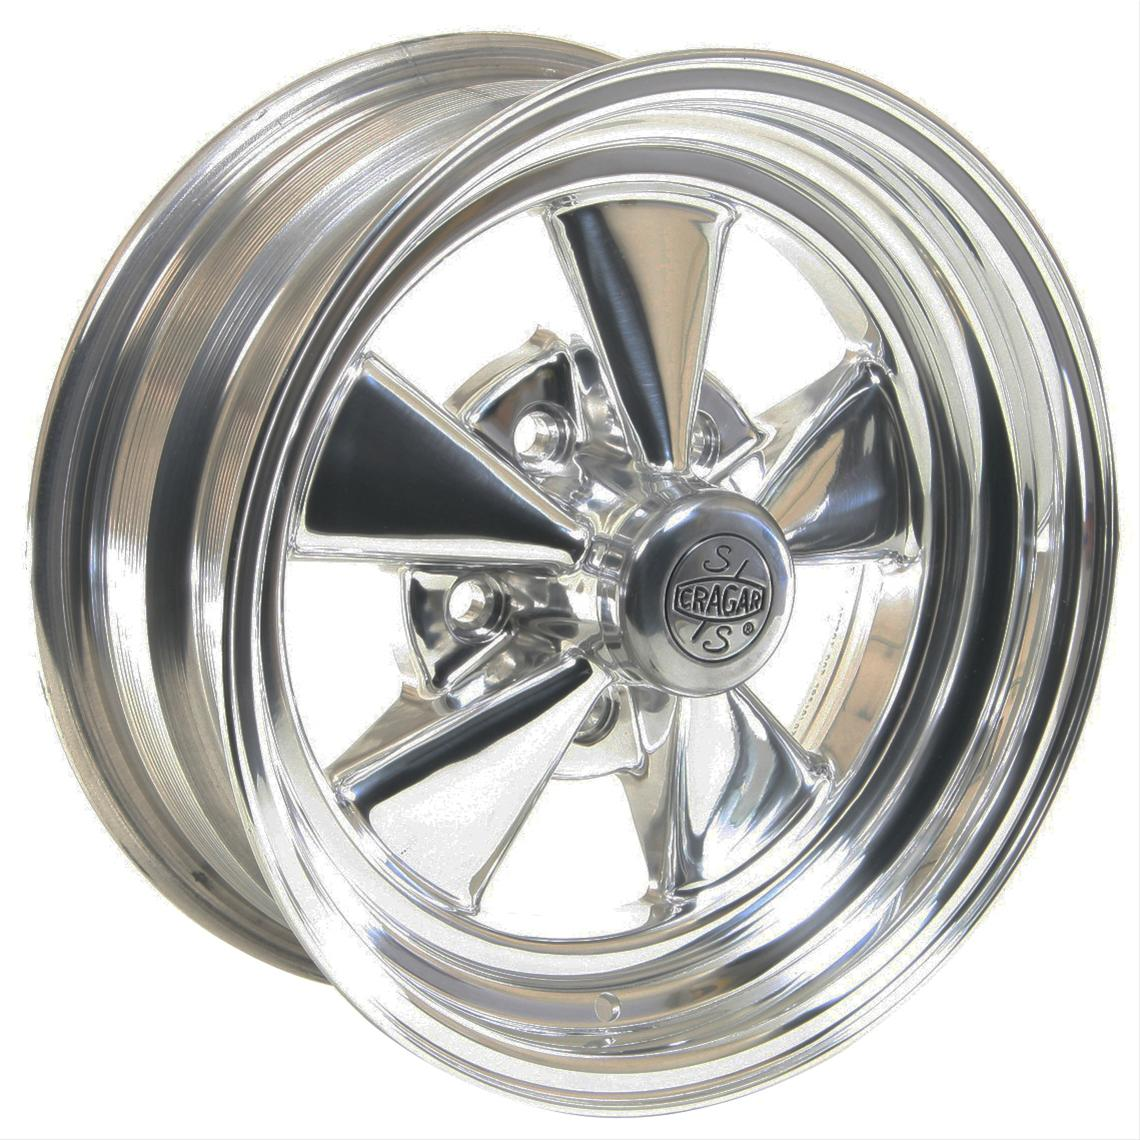 Cragar-SS-2-Piece-Aluminum-Polished-Wheels